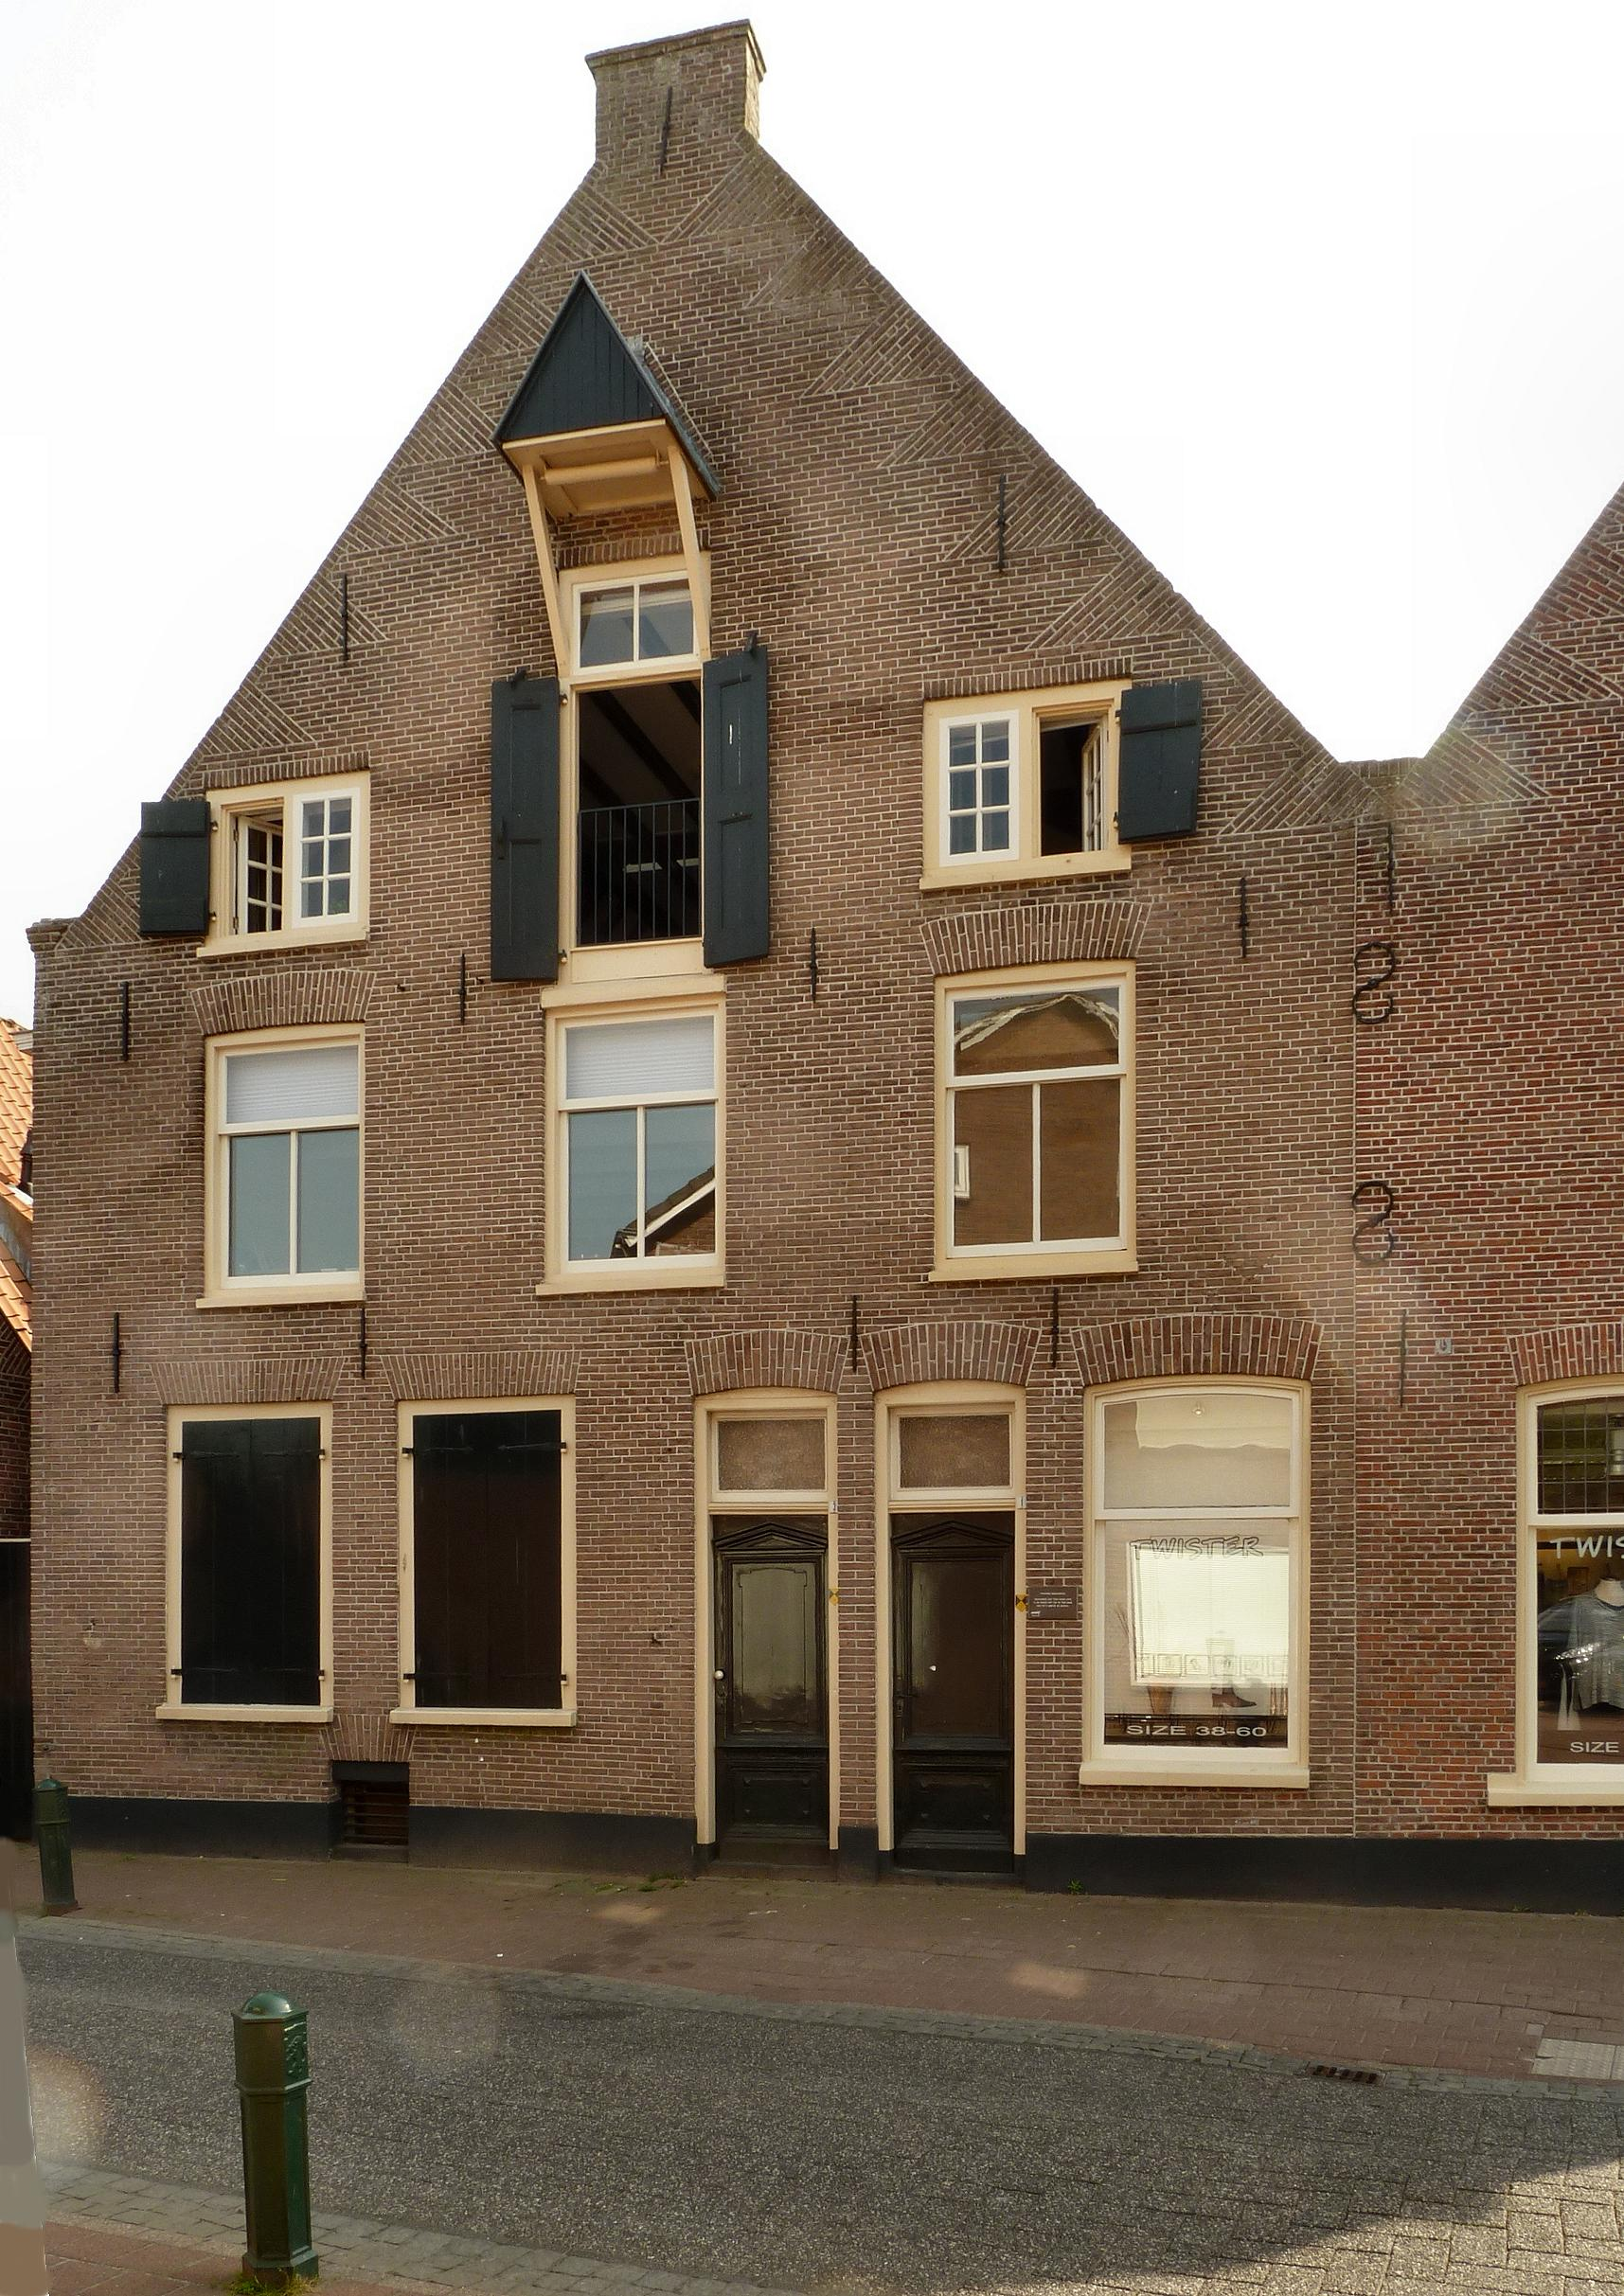 Tabakspakhuis in Nijkerk